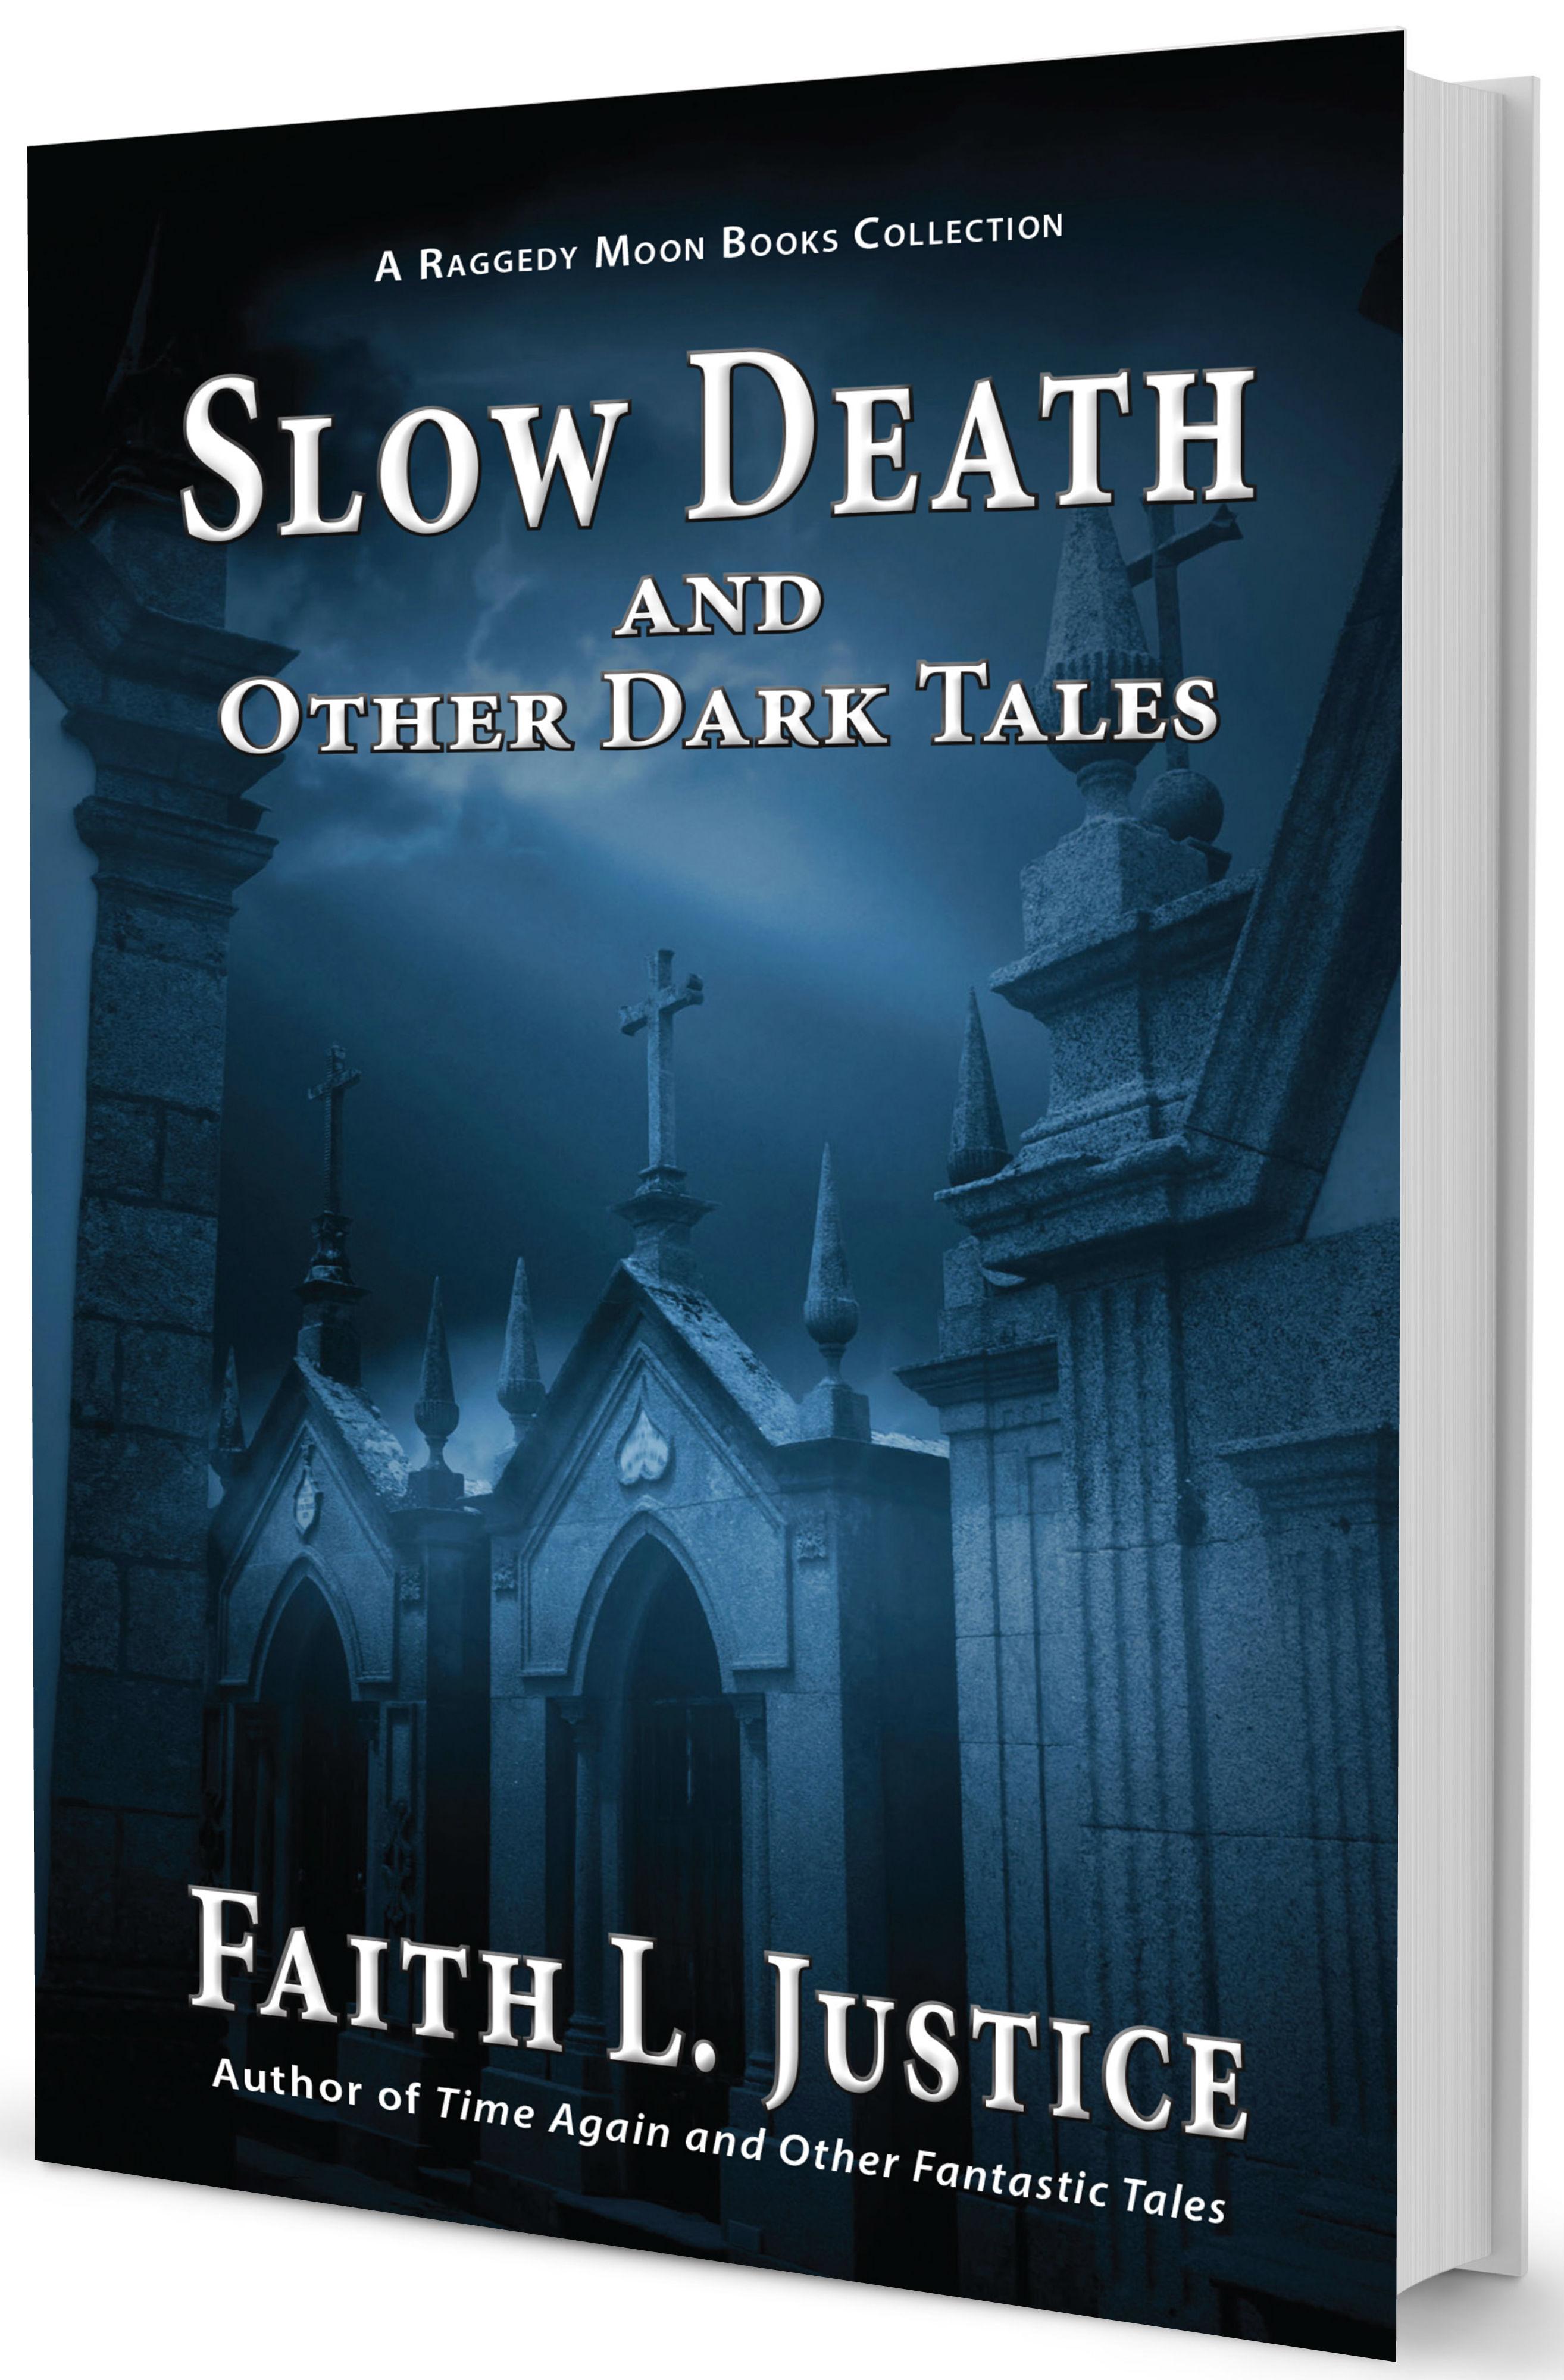 Dark empress tales of the empire volume 3 ebook sworn to vengeance 900x1350 array books faith l justice rh faithljustice com fandeluxe Images